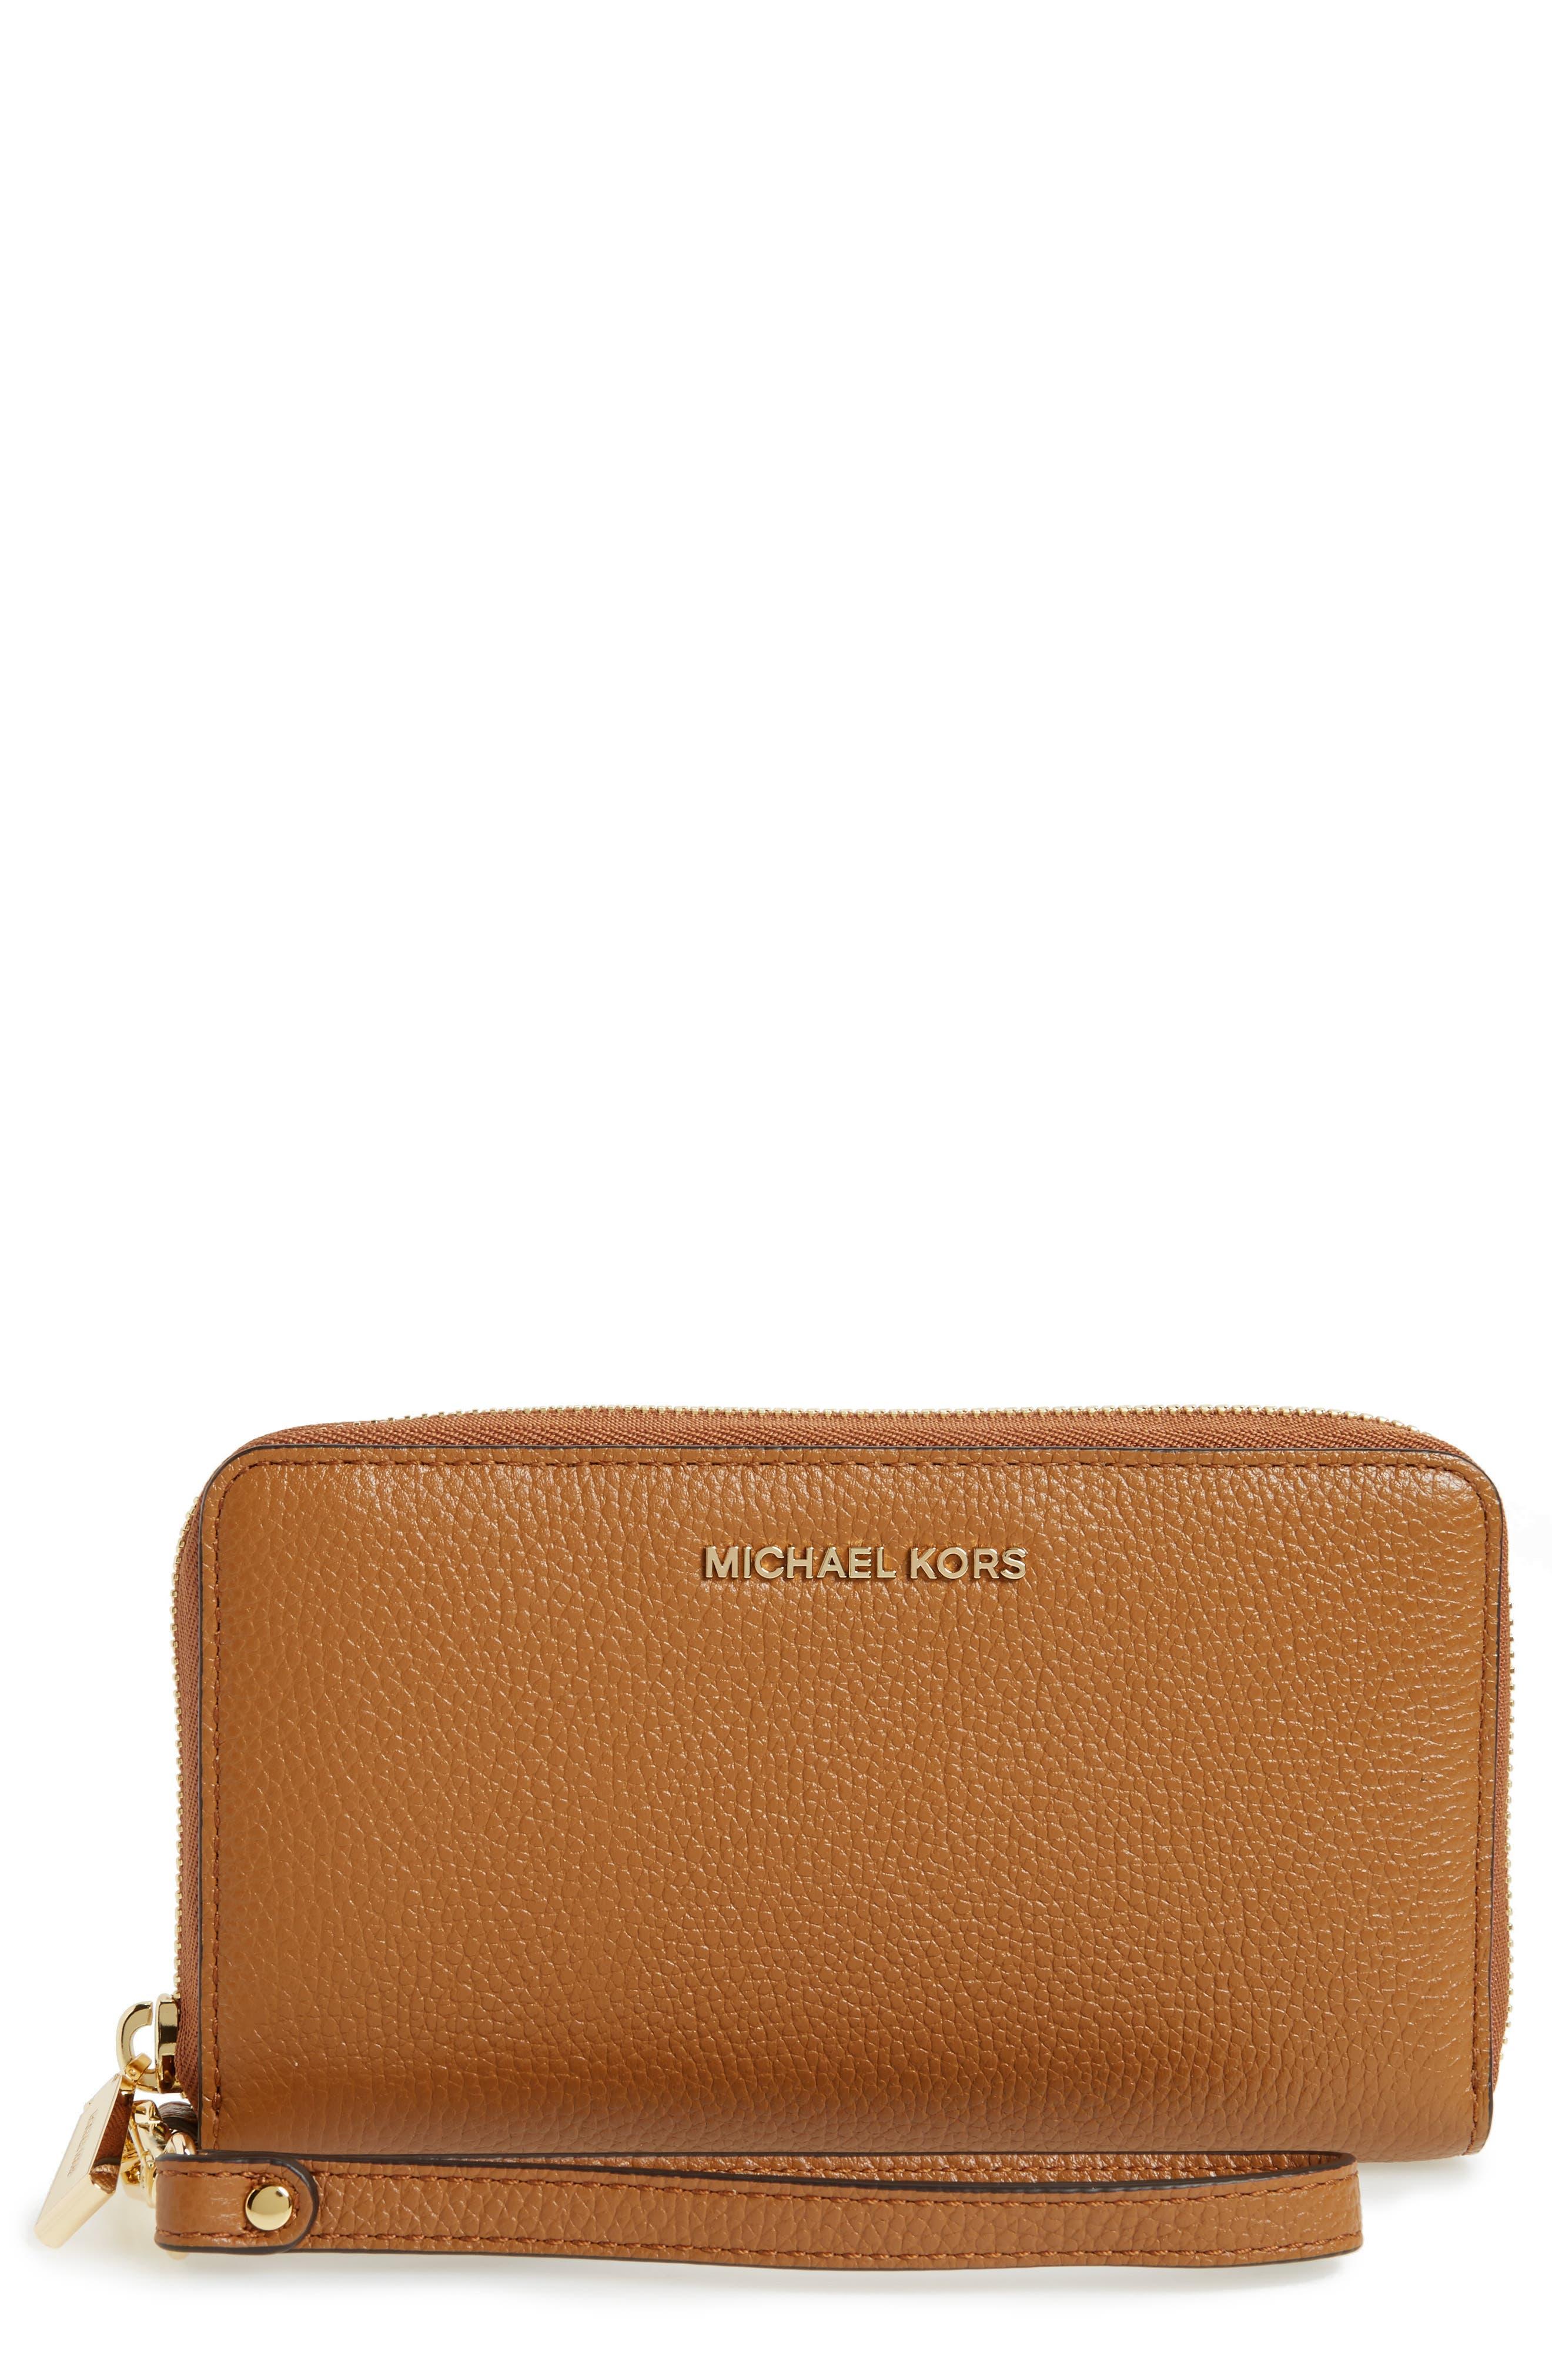 Mercer Large Leather Tech Wristlet,                             Main thumbnail 1, color,                             Acorn